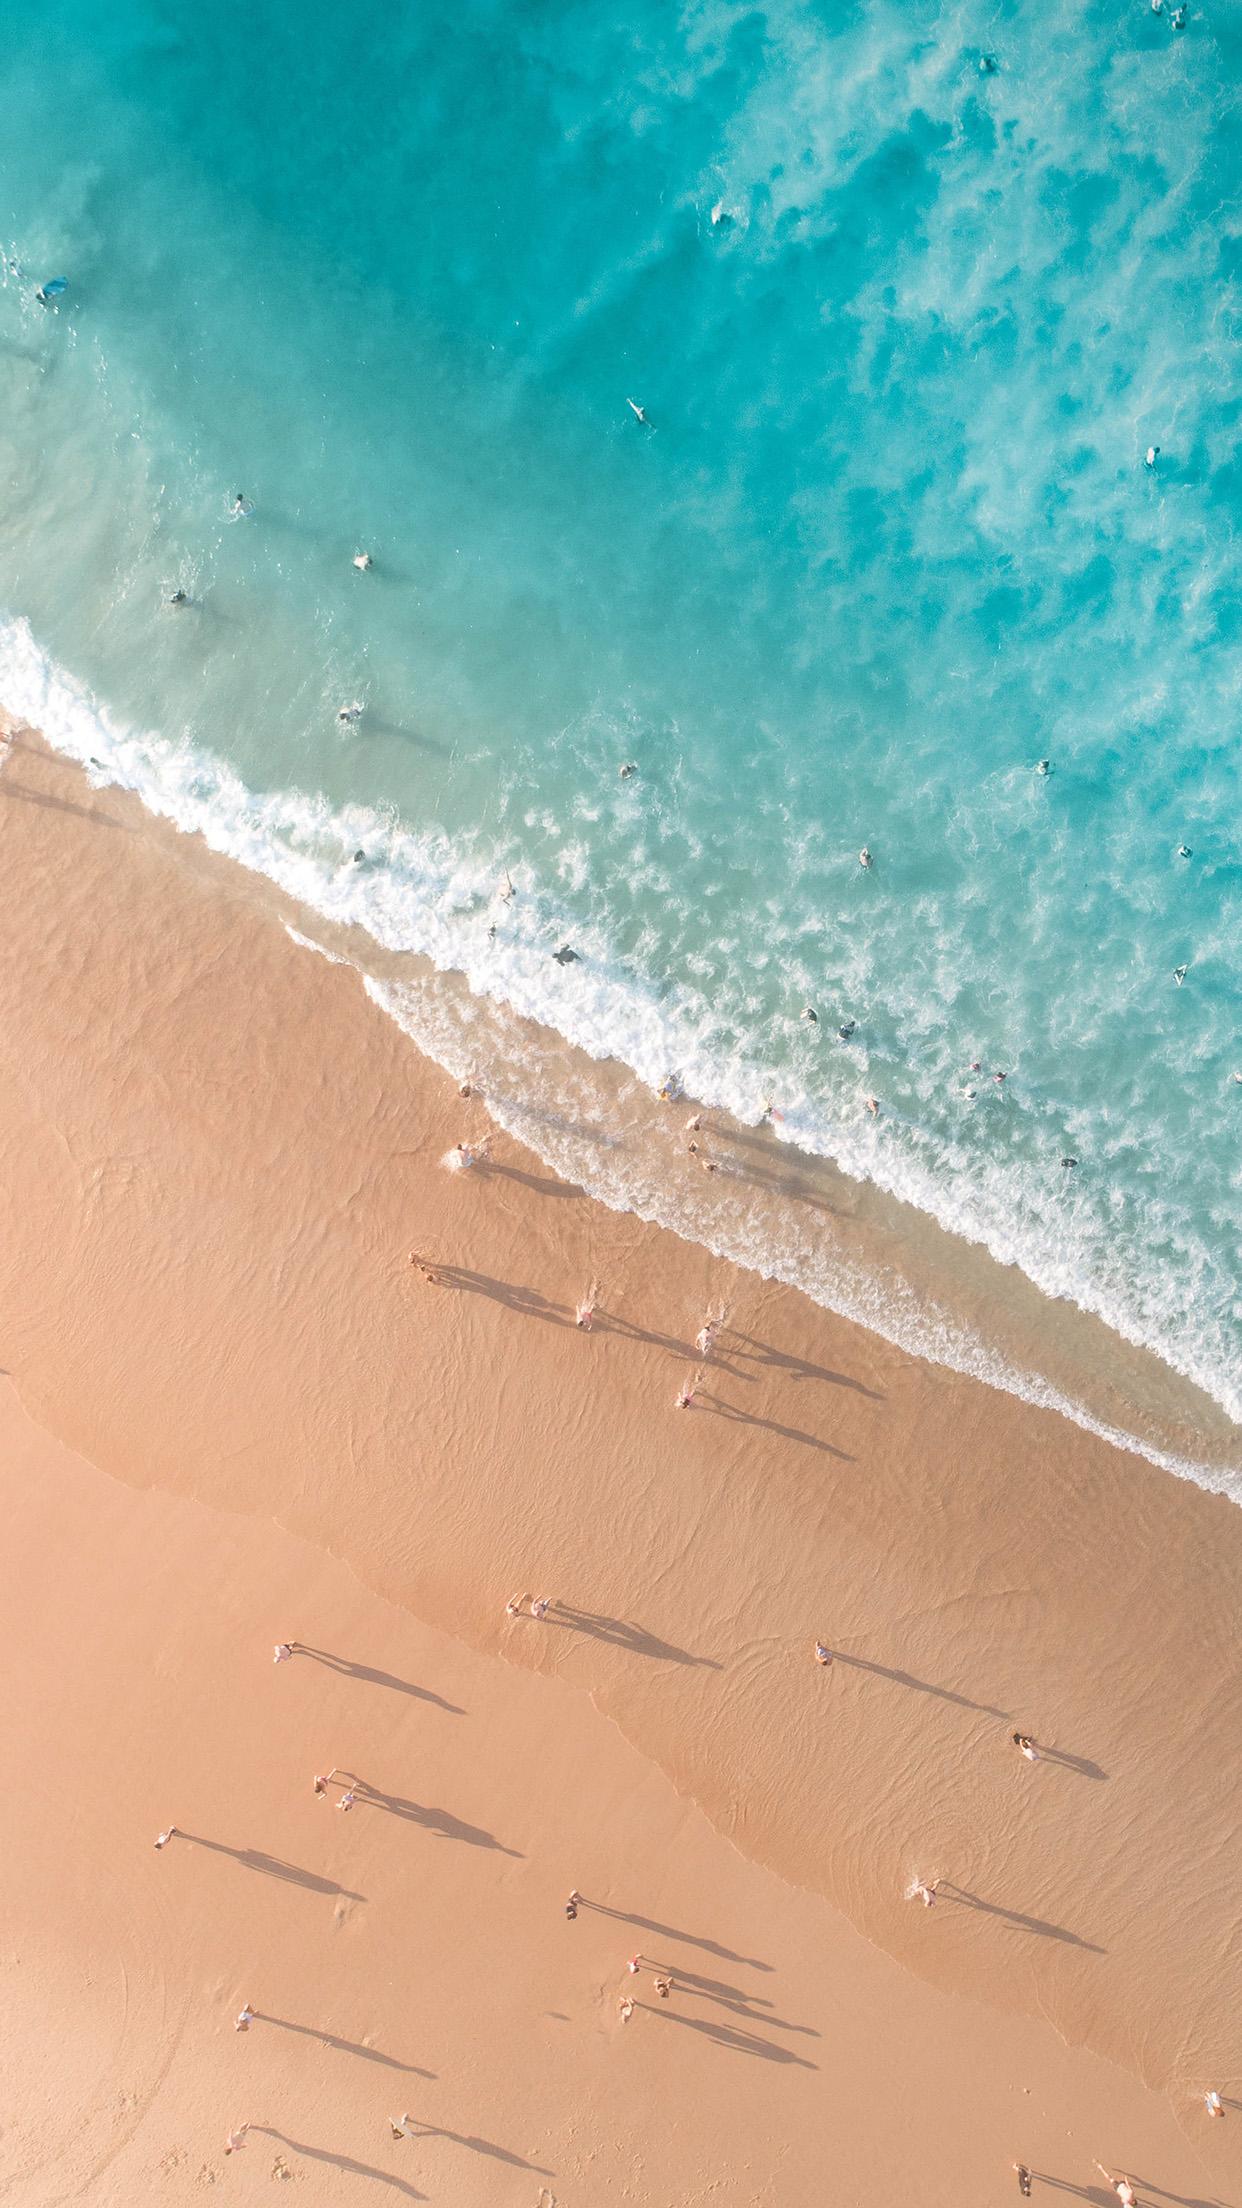 Iphone6paperscom Iphone 6 Wallpaper Oc67 Sea Vacation